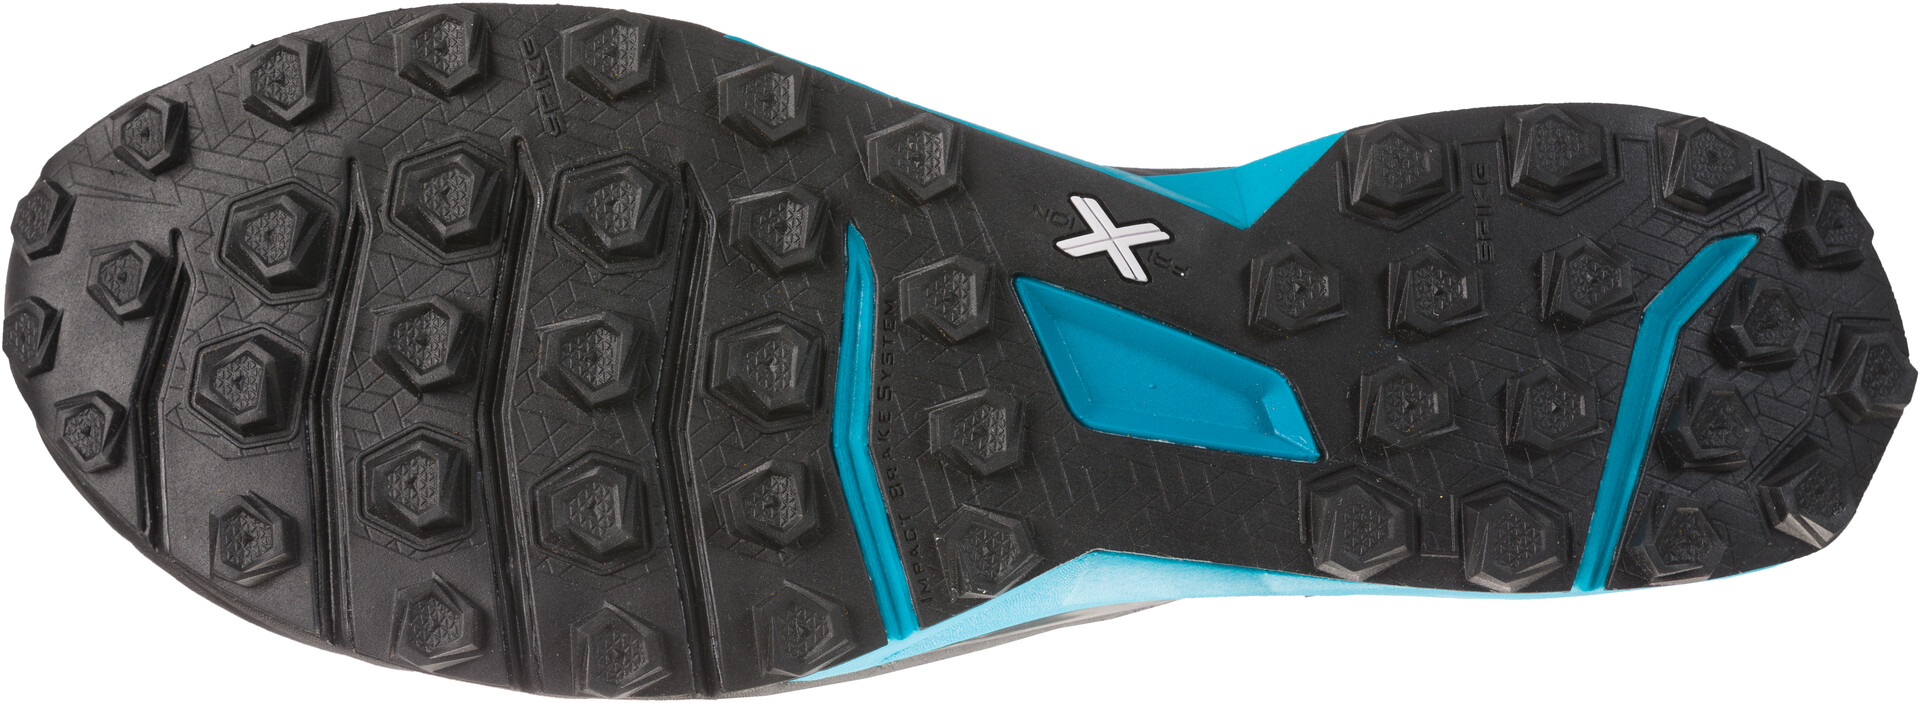 Shoes Herren La Sportiva Kaptiva Blue Carbontropic Running dBWCxeor